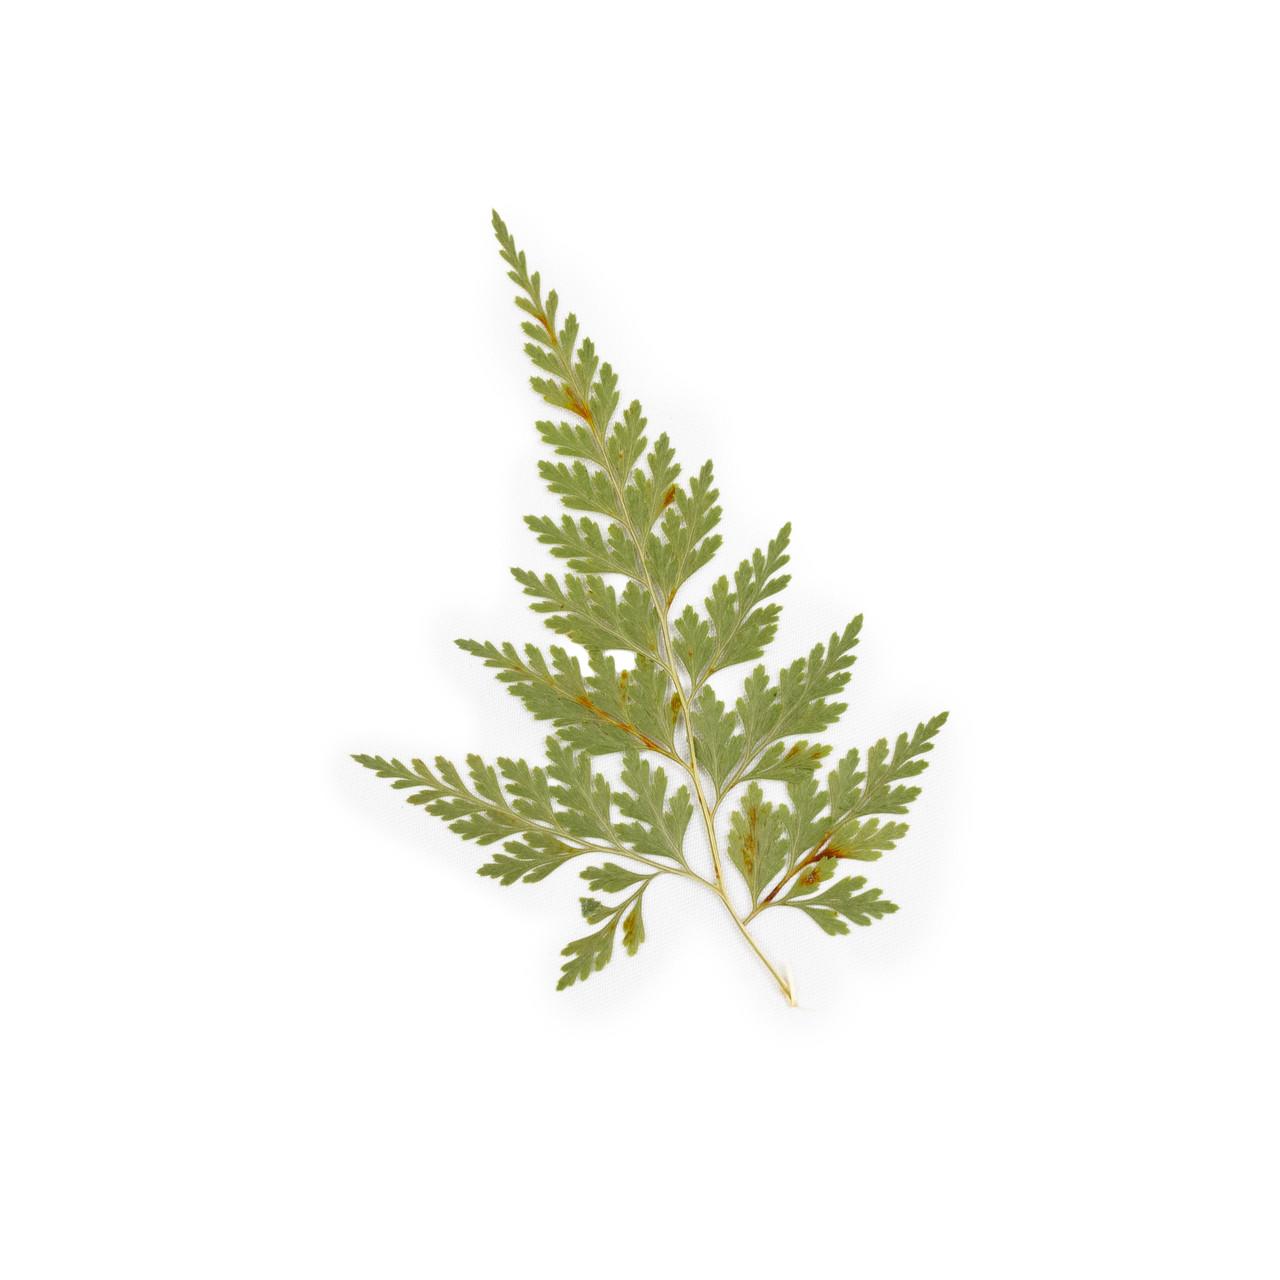 Pressed Botanical - Fern